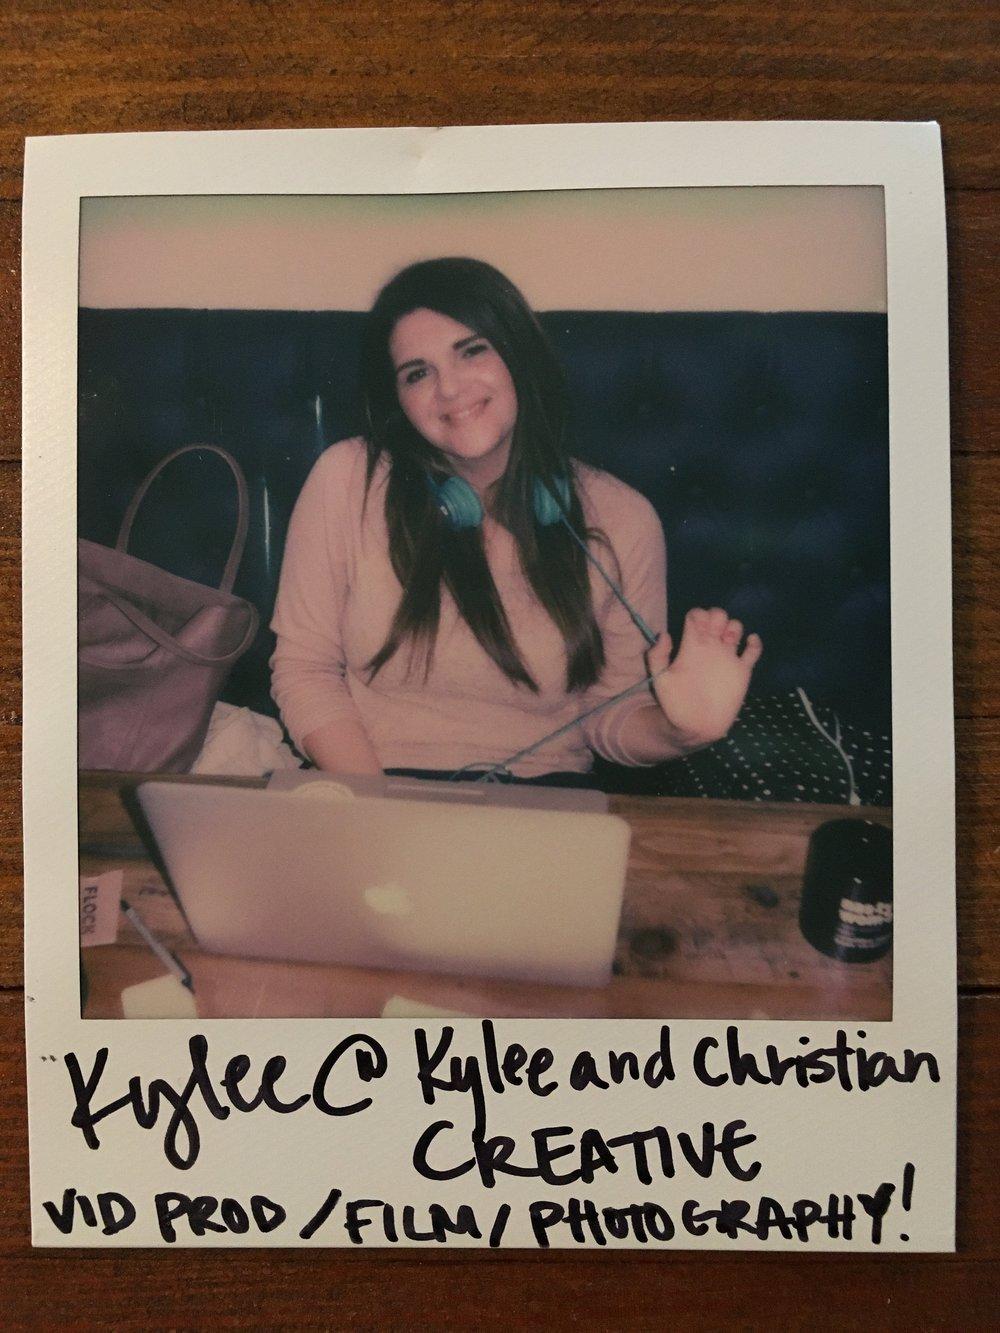 Kylee Leonetti - Kylee and Christian Creative, GirlCreative, Leonetti Confetti